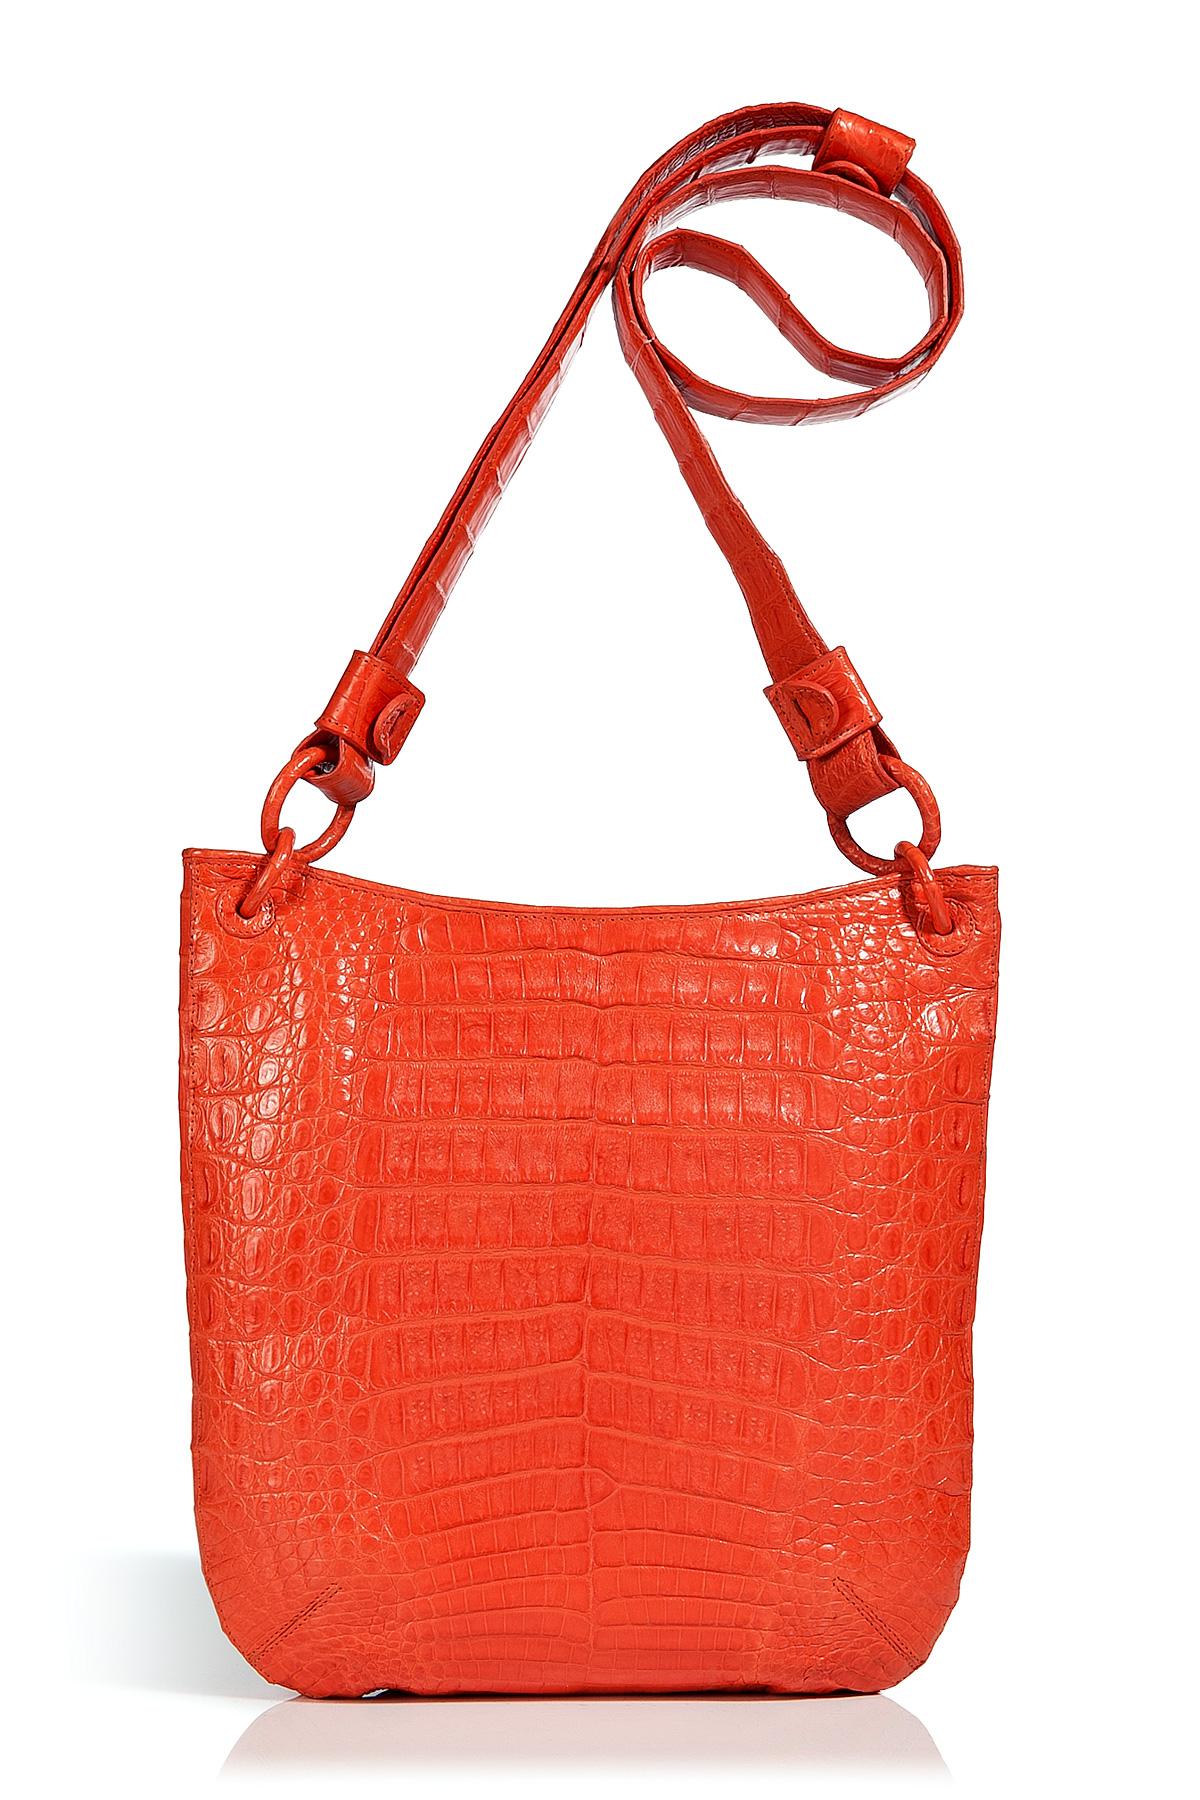 nancy gonzalez bright orange crocodile crossbody bag in